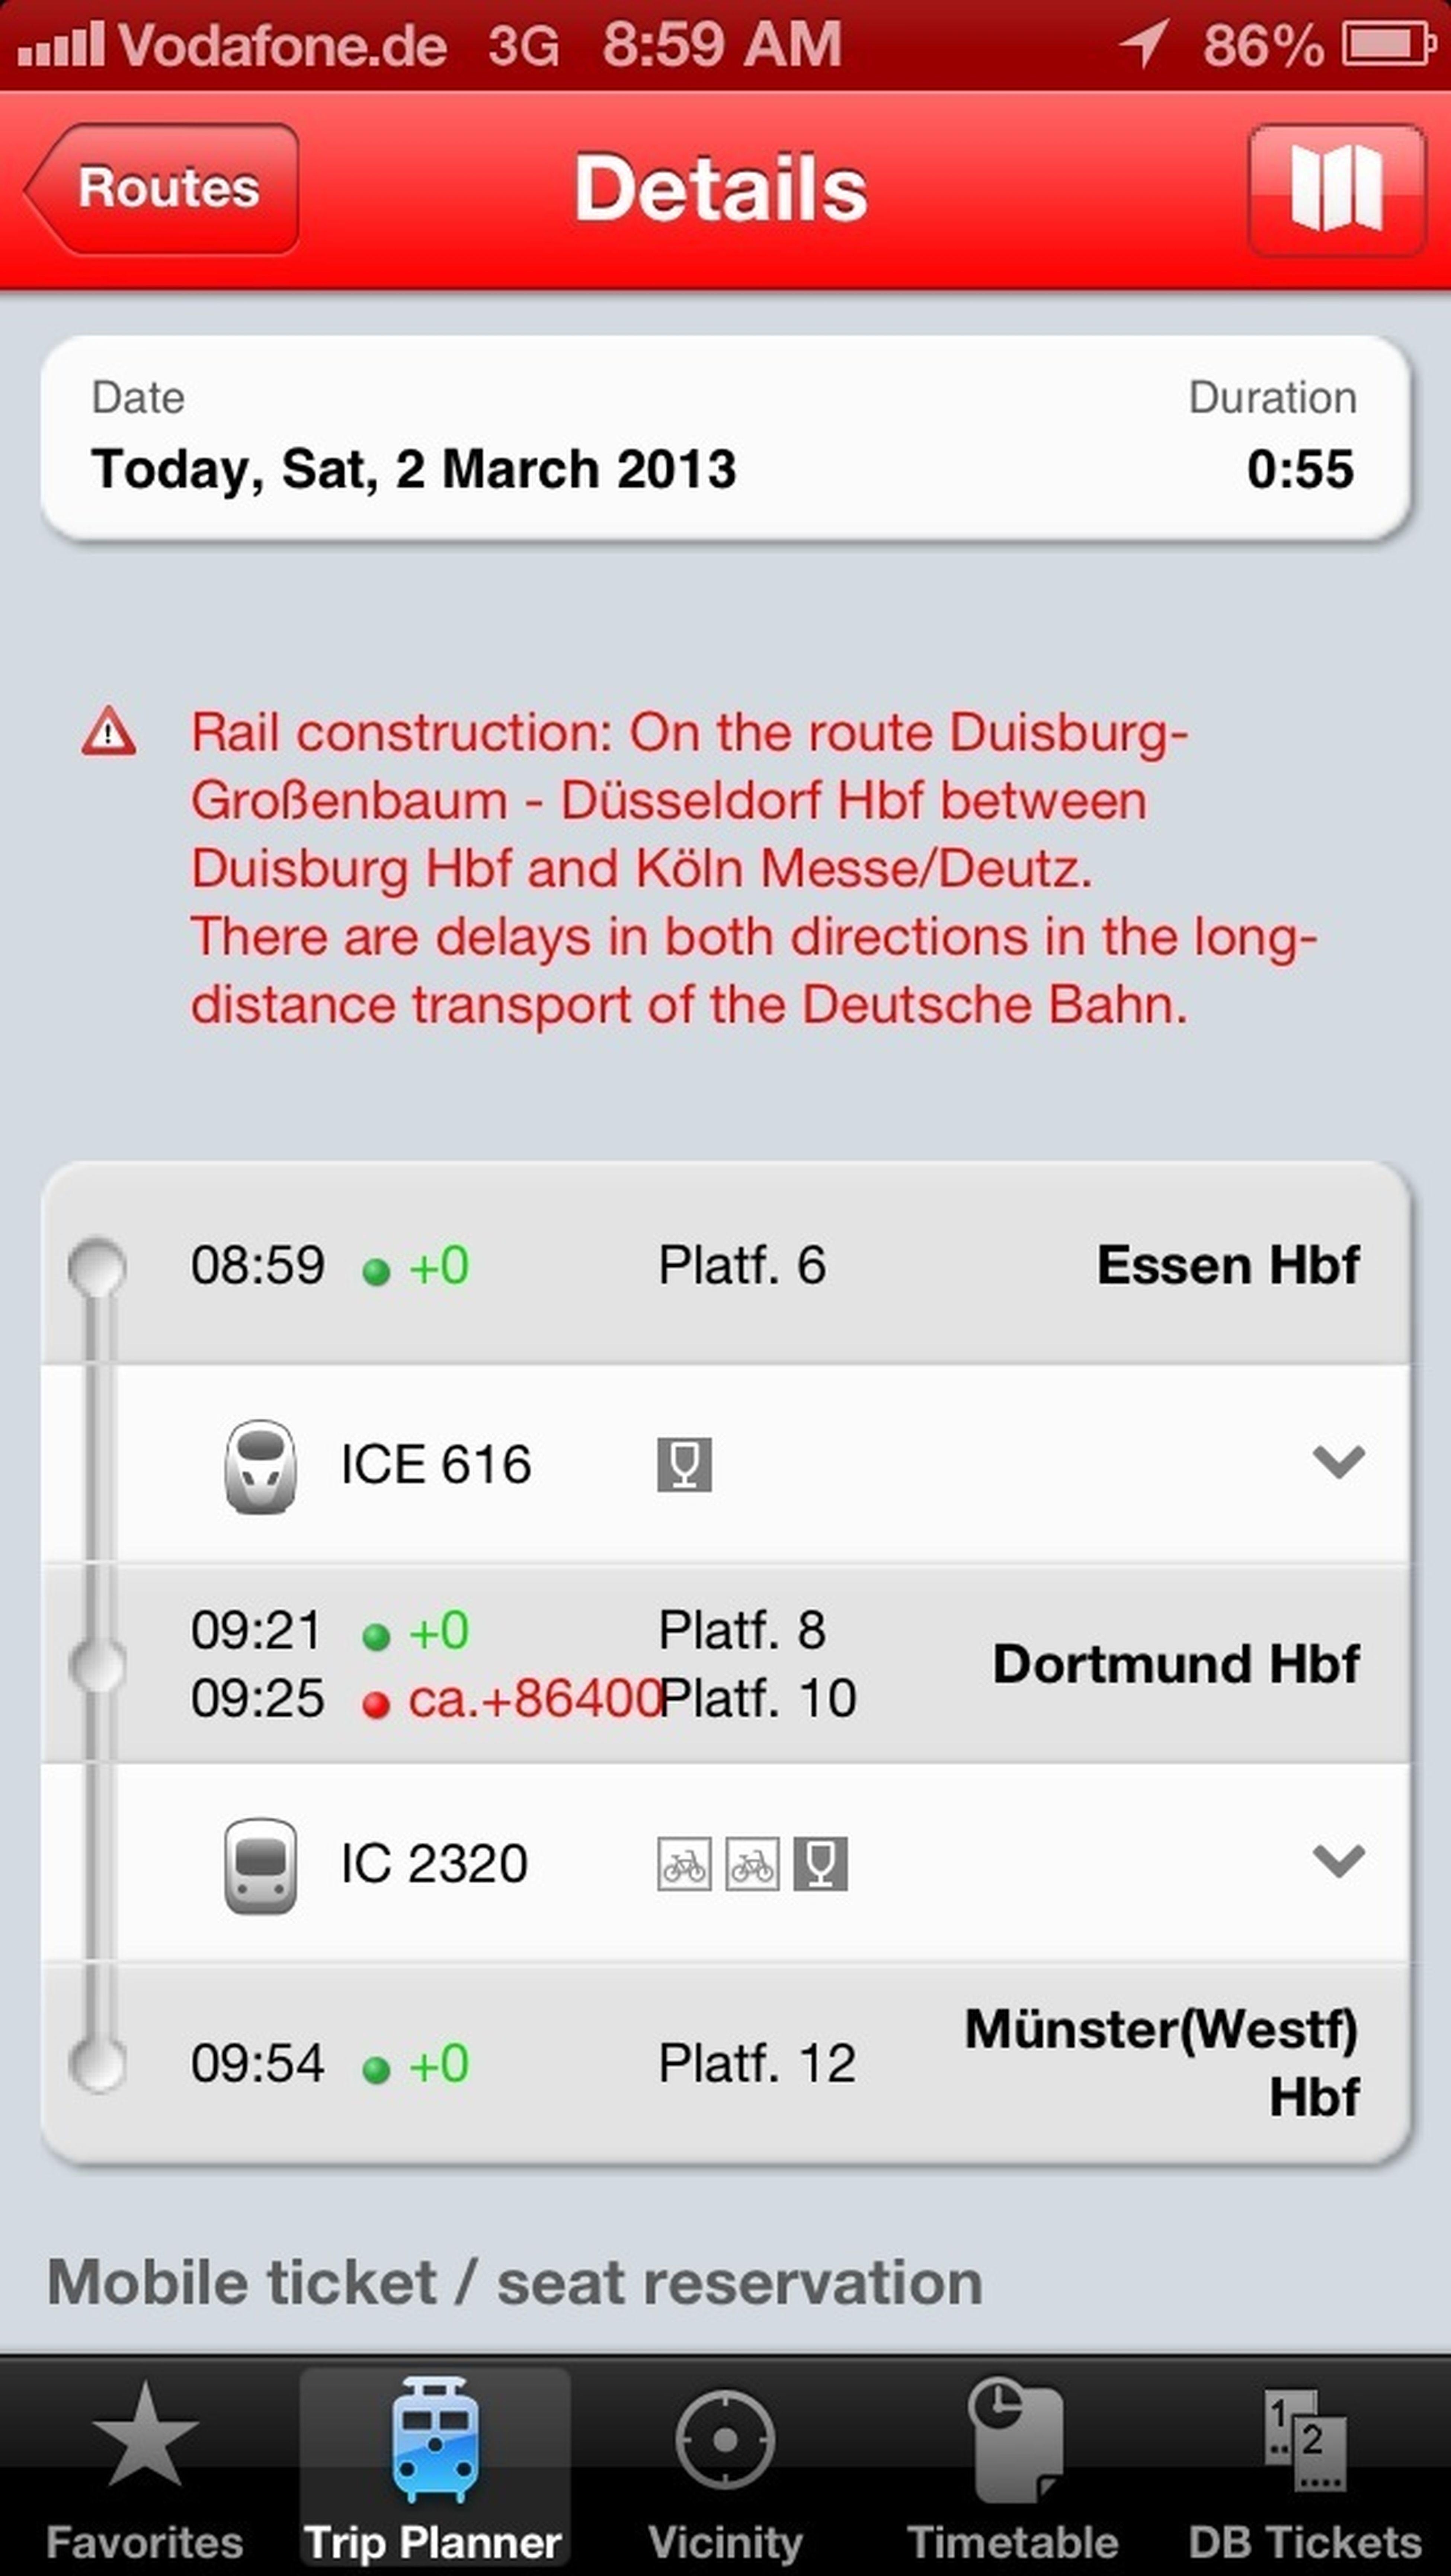 Neuer Bahnrekord: 86400 Minuten Verspätung #bahn #db